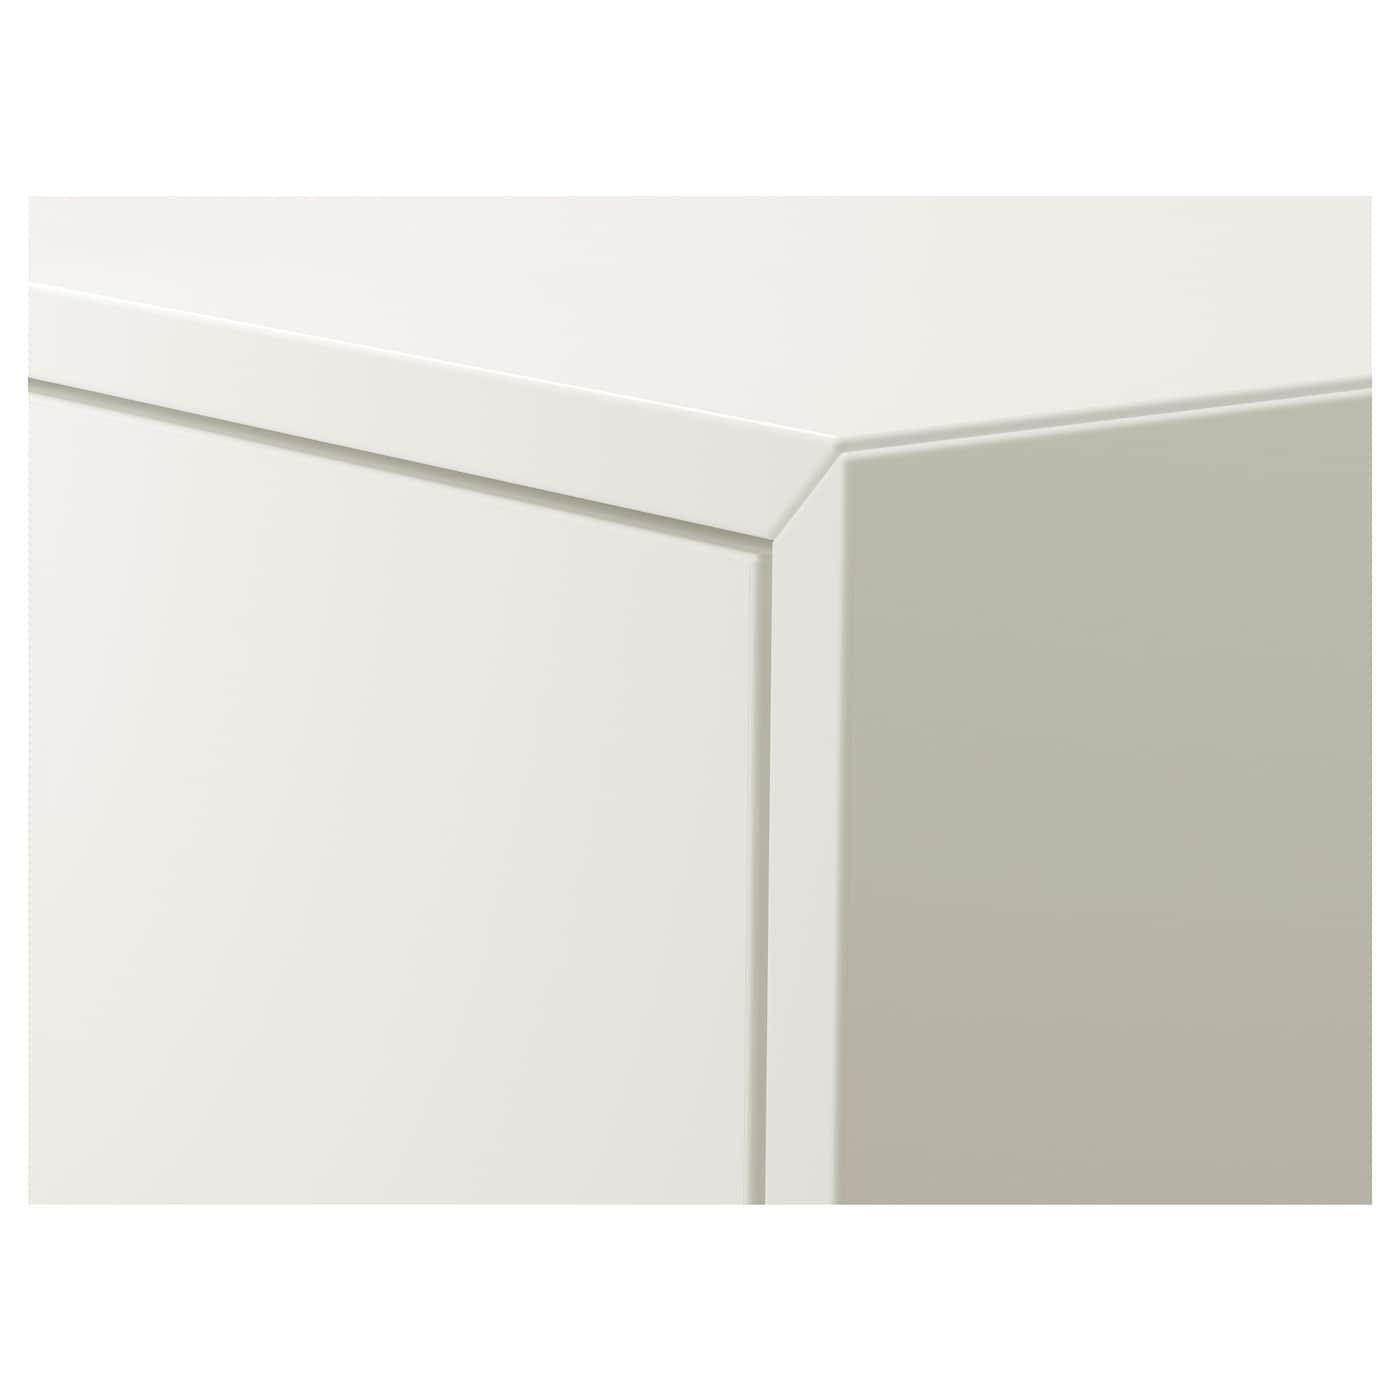 EKET cabinet with door white 35 cm 35 cm 35 cm 7 kg